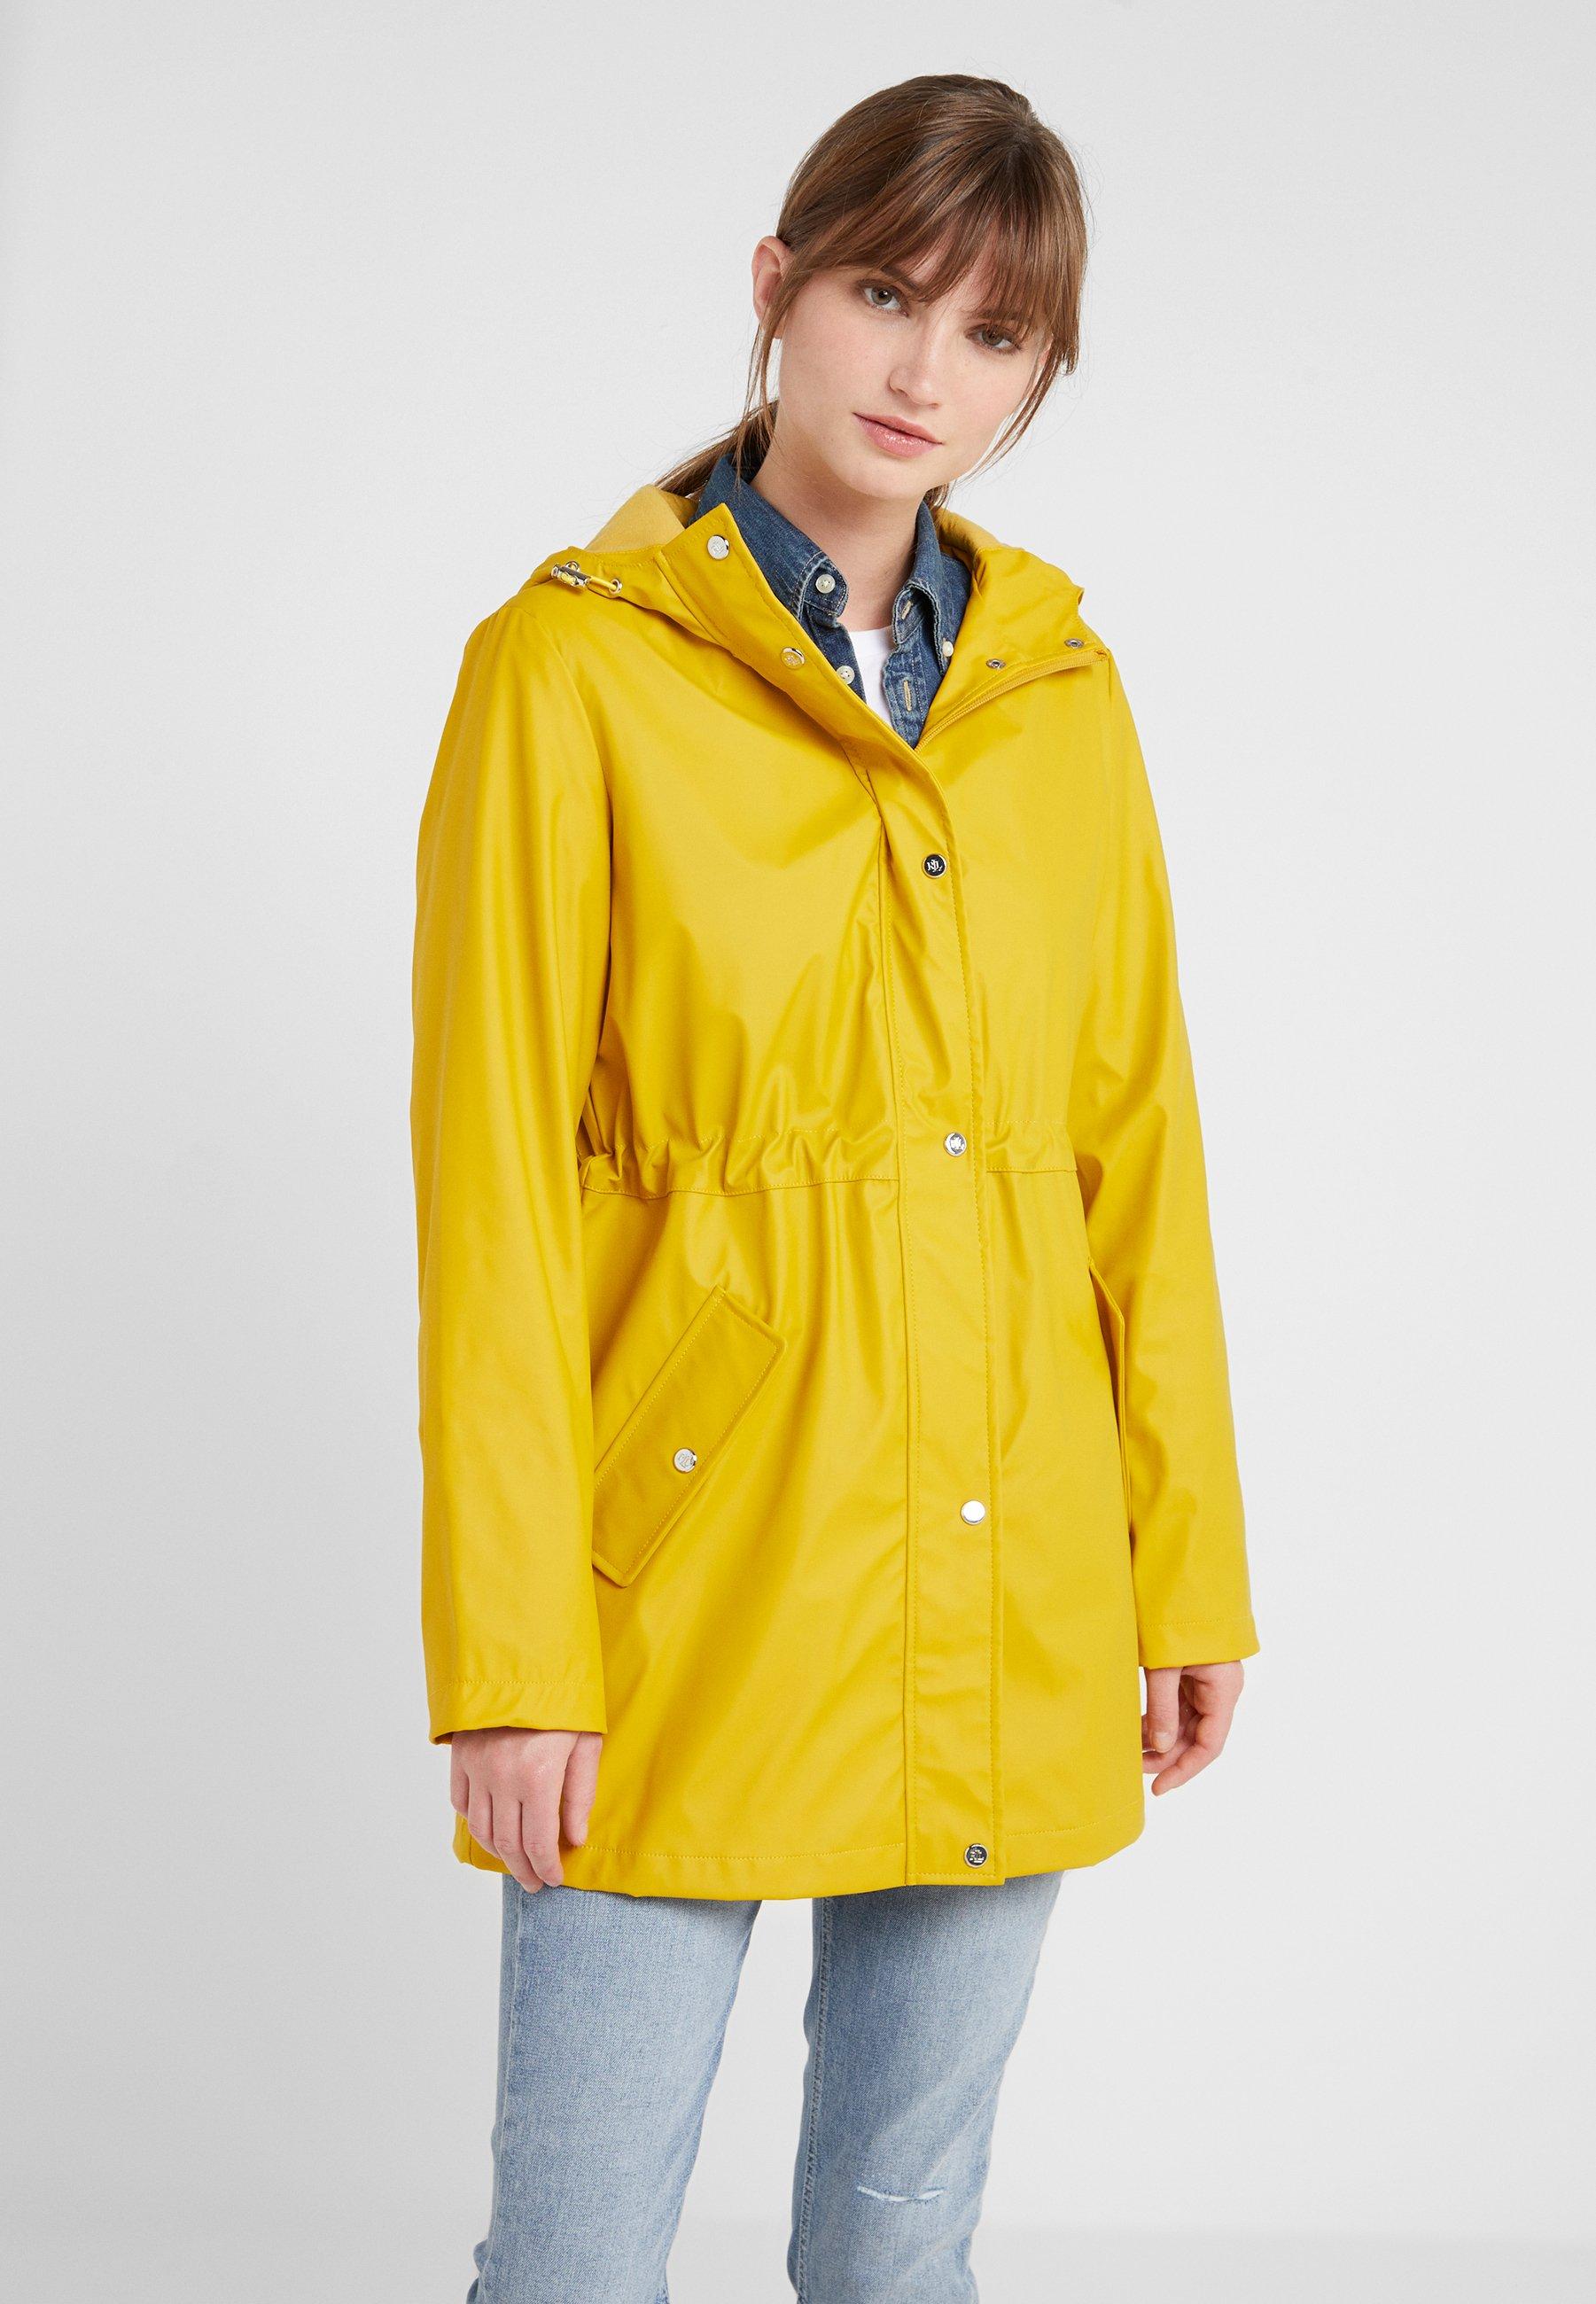 Lauren SlickerParka Rain Deep Yellow Ralph wvmN8n0